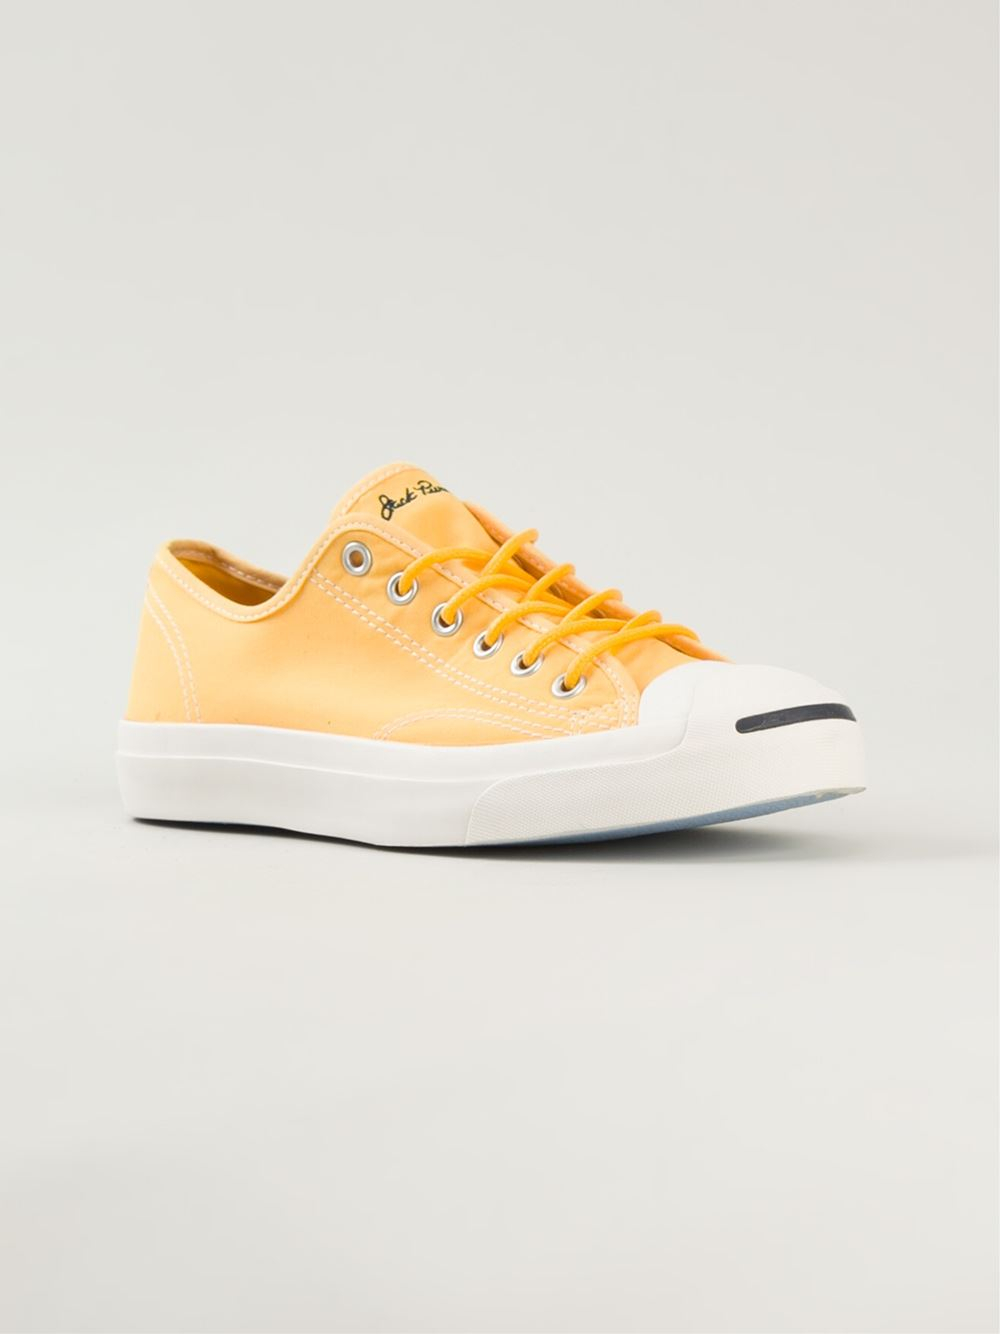 b142d19fec40e4 Converse Converse Converse Purcell Yellow In Lyst X Sneakers Men    jack   jack  jack  jack For OHvnxU